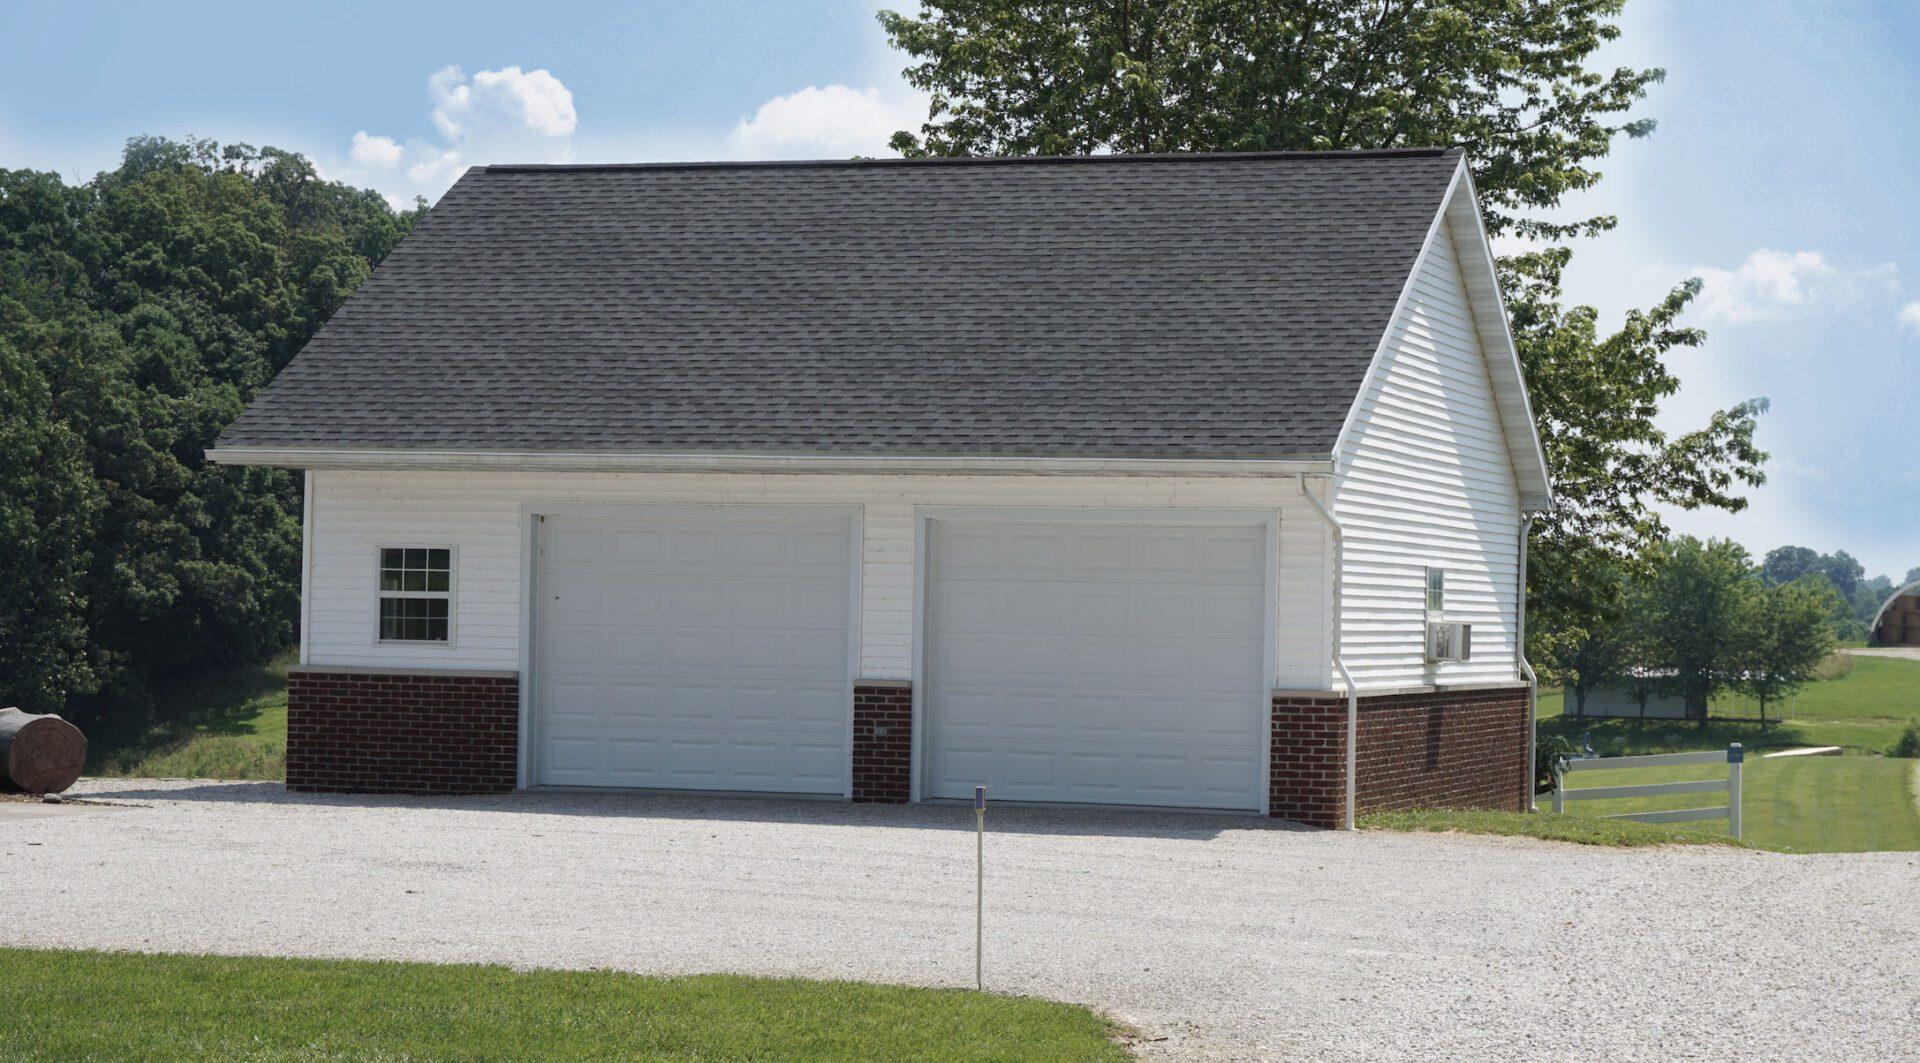 Two garage doors of a building